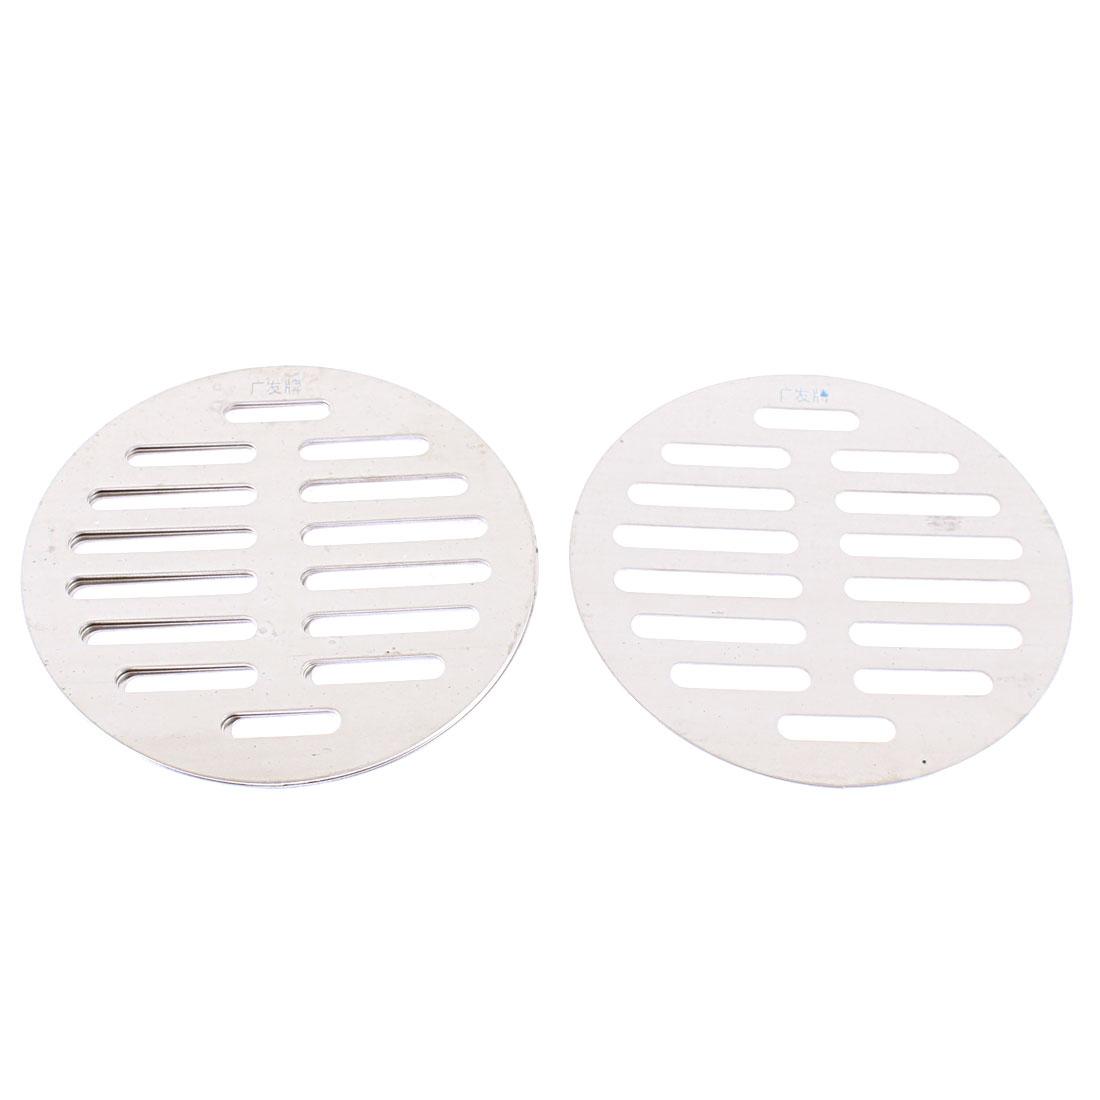 "Stainless Steel Kitchen Bathroom Round Floor Drain Cover 4.4"" 11.3cm 5pcs"